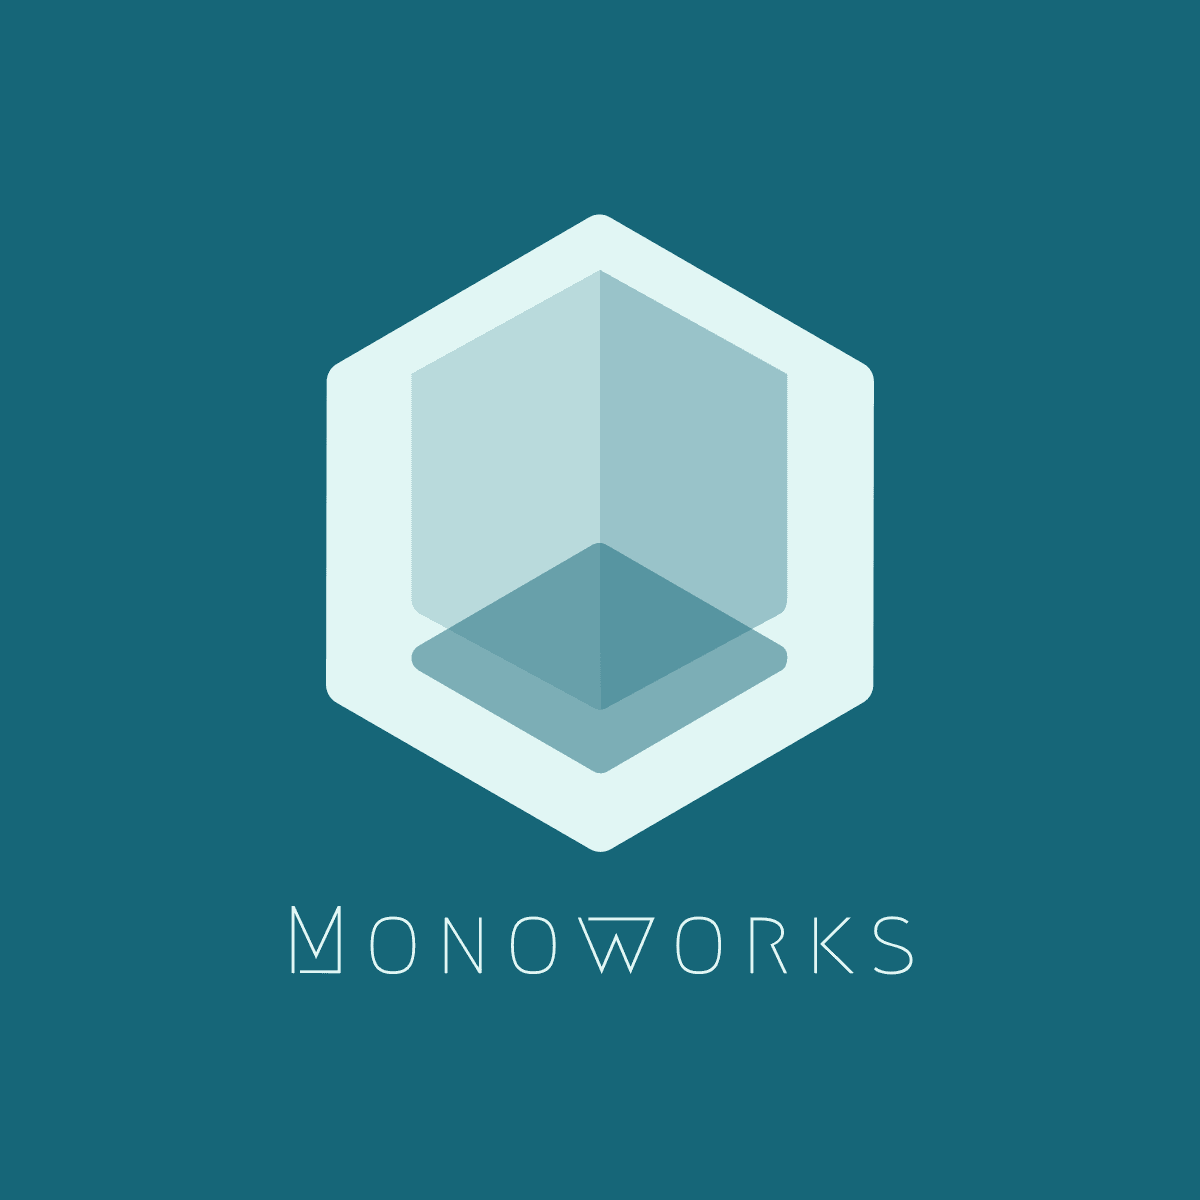 Monoworks image